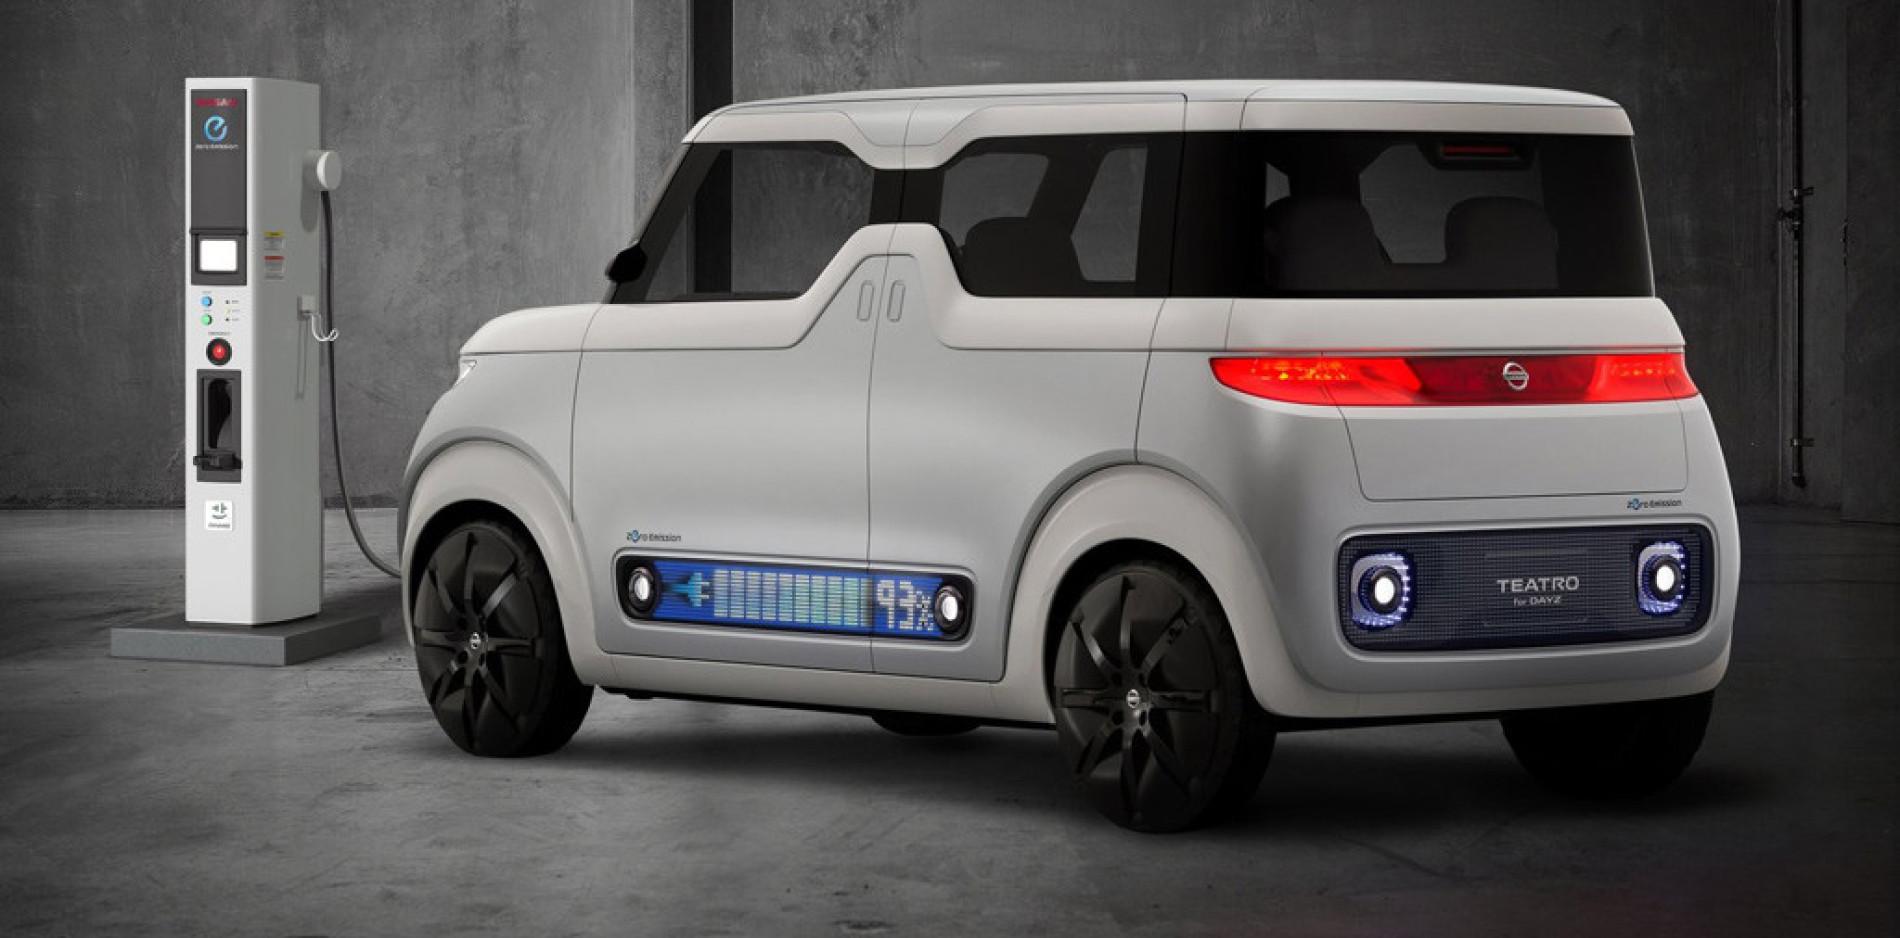 Nissan Teatro for Dayz Concept: mundo virtual